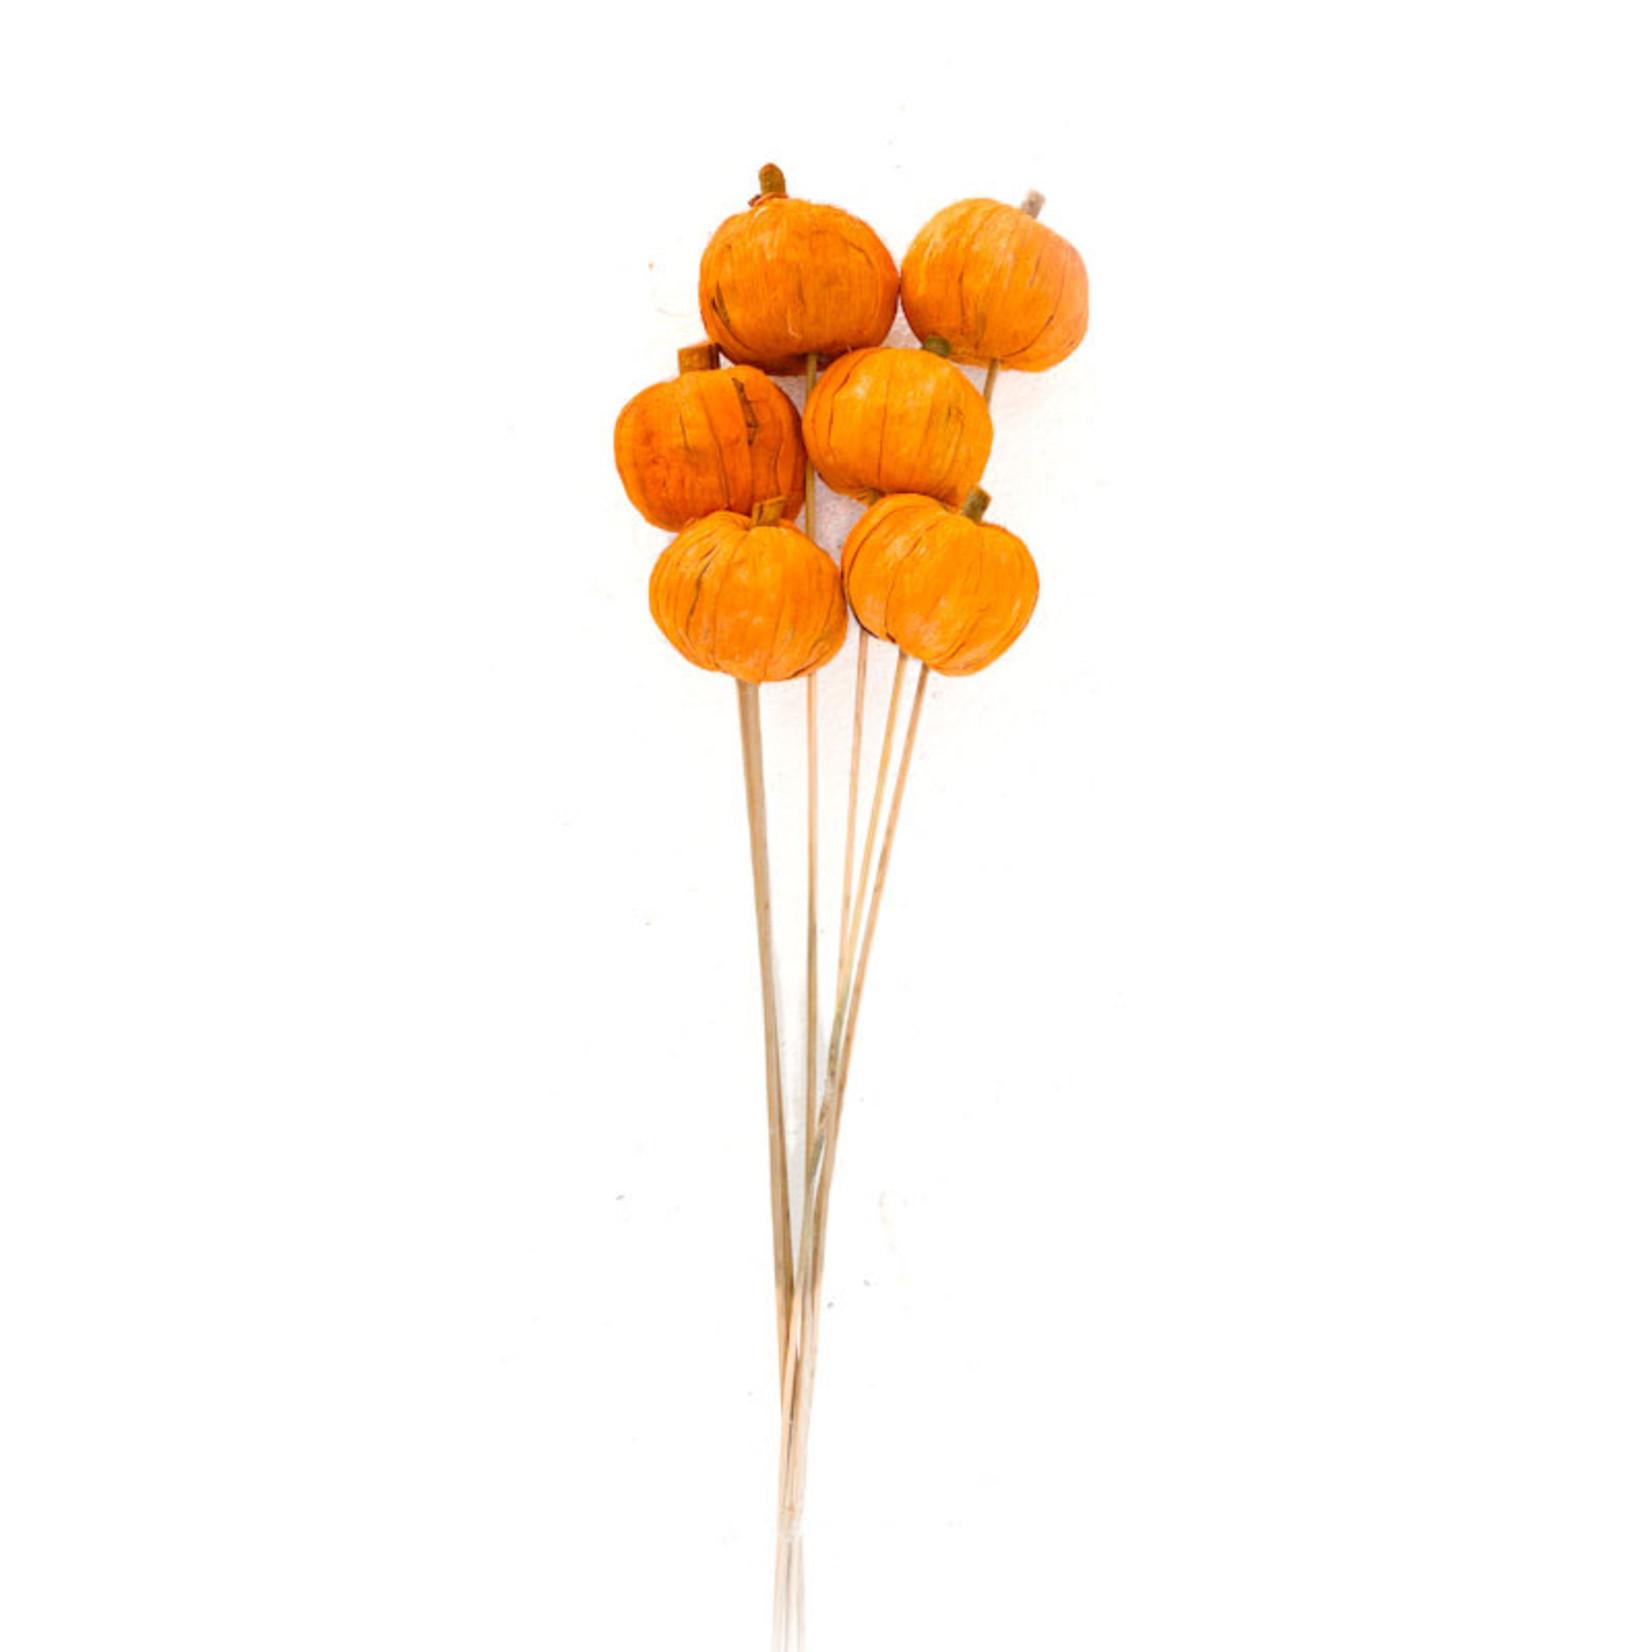 Pumpkins on Stem 'Yellow' 6/pkg